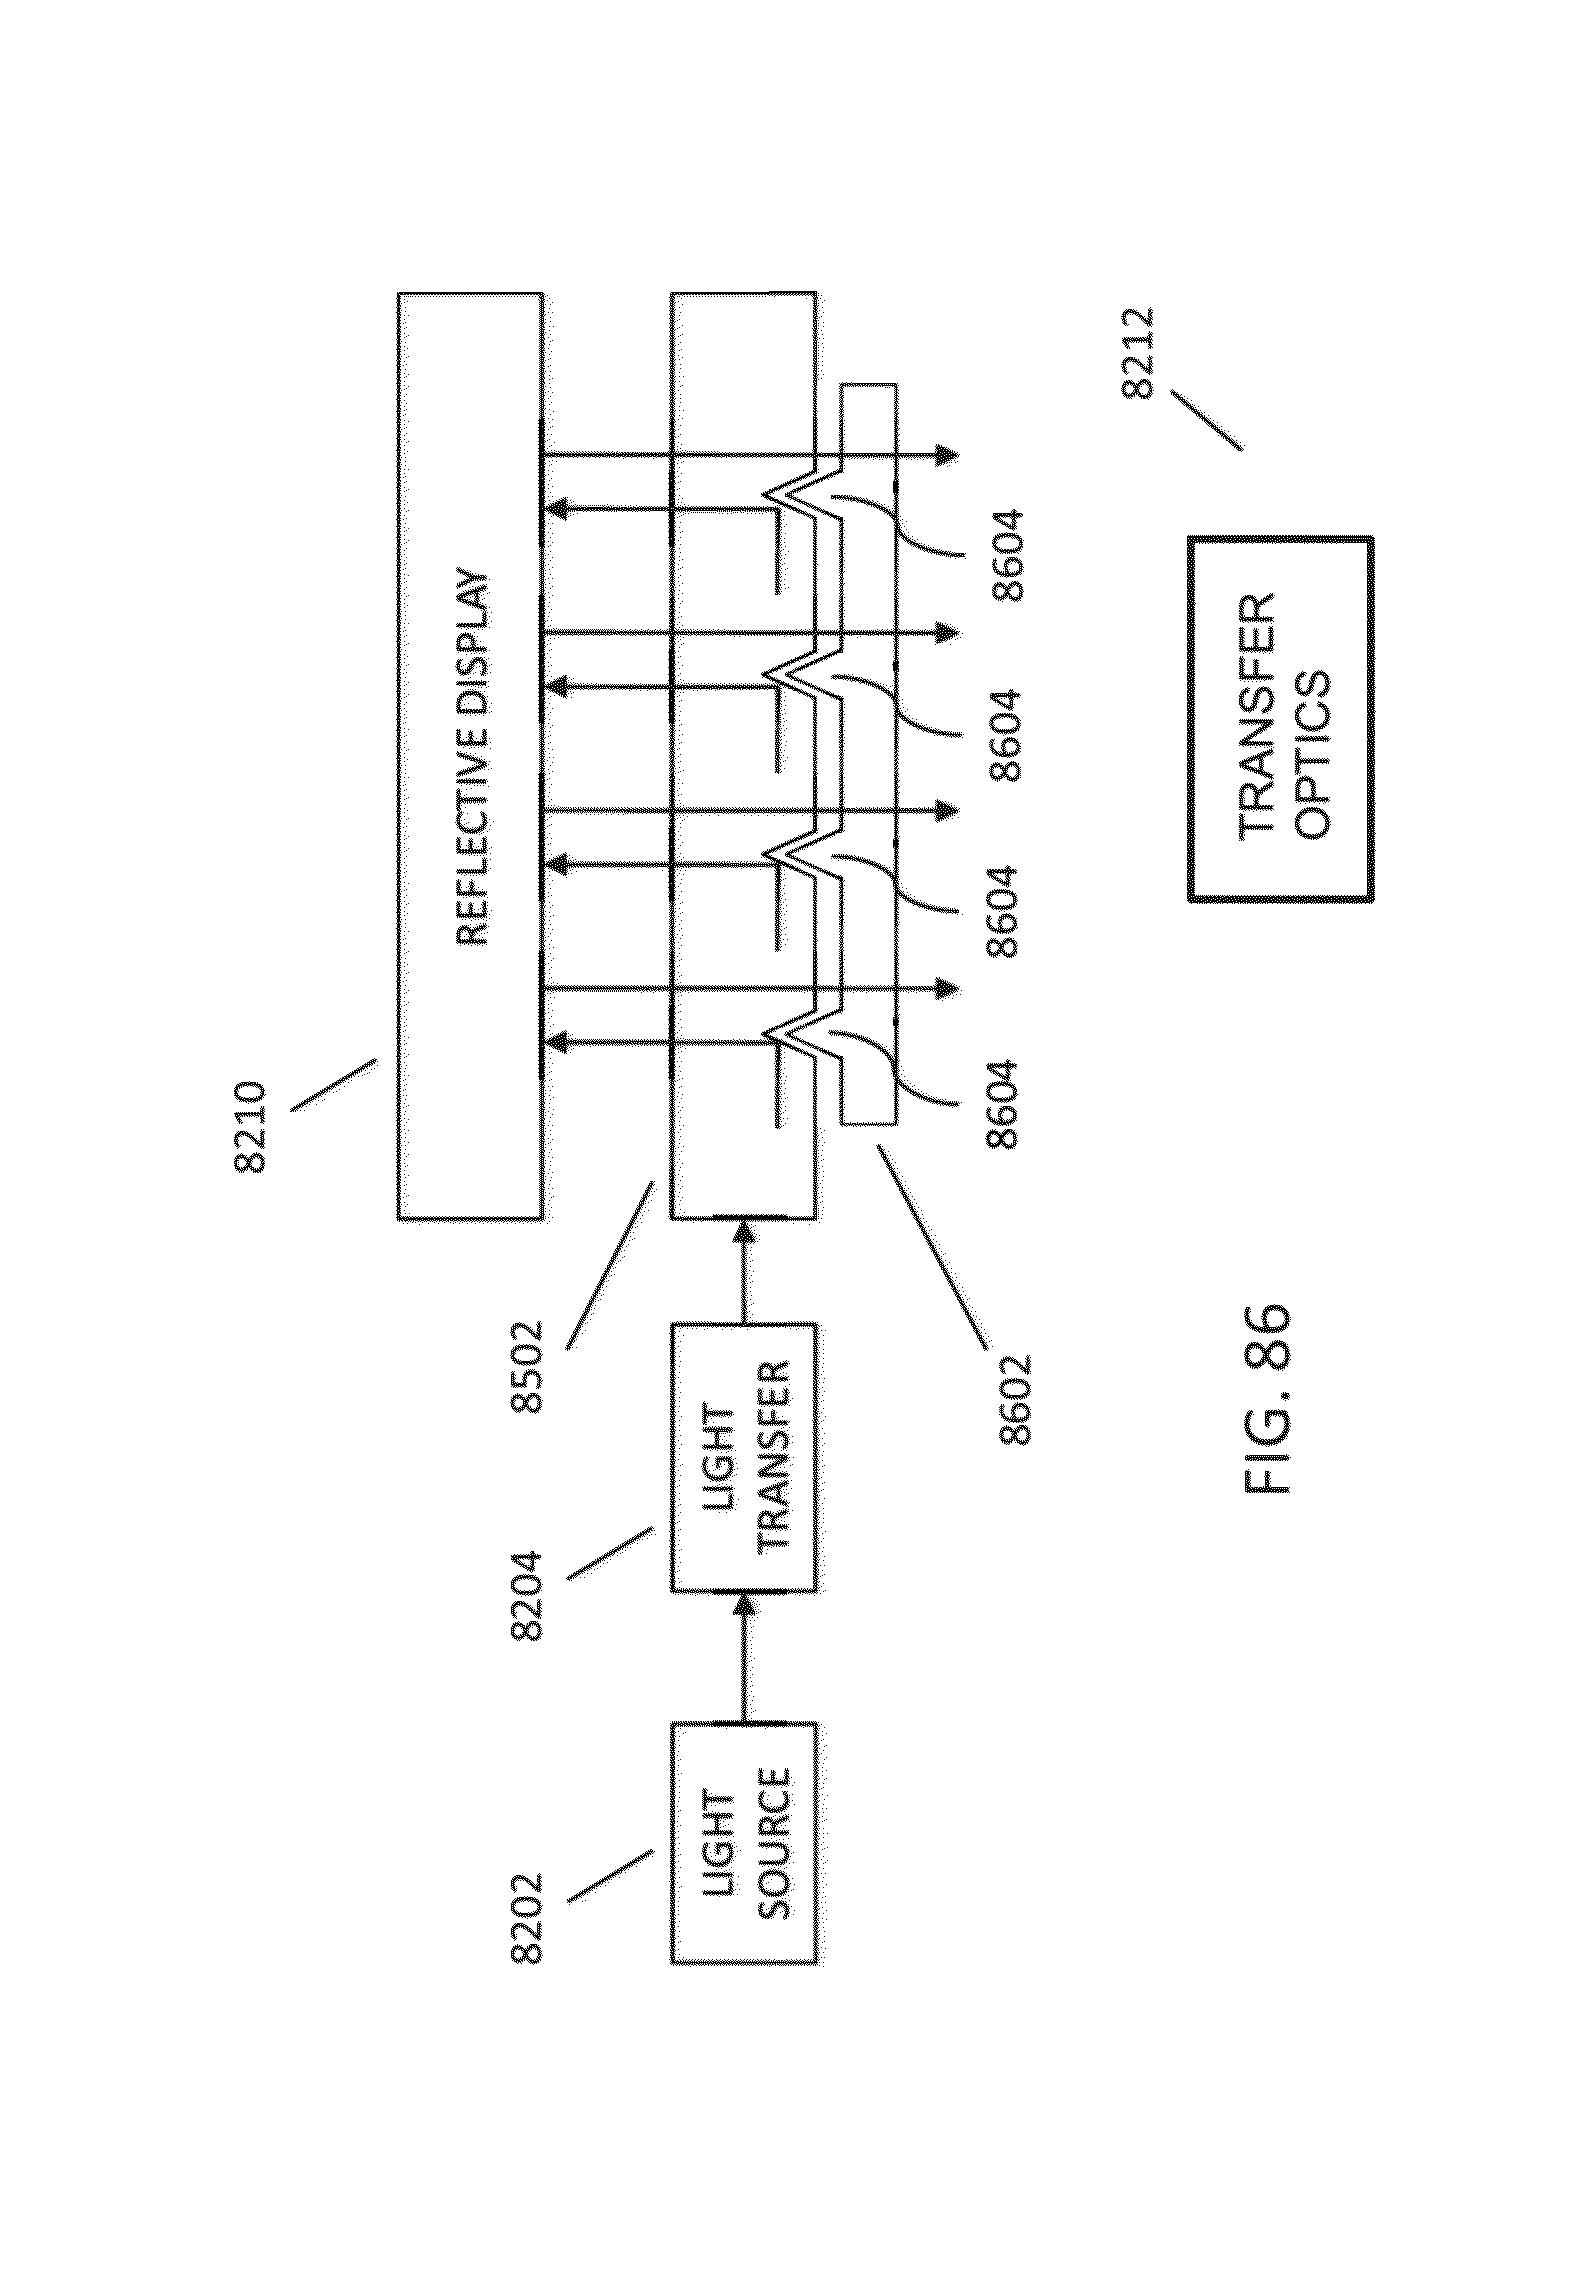 Patent US 8,964,298 B2 on